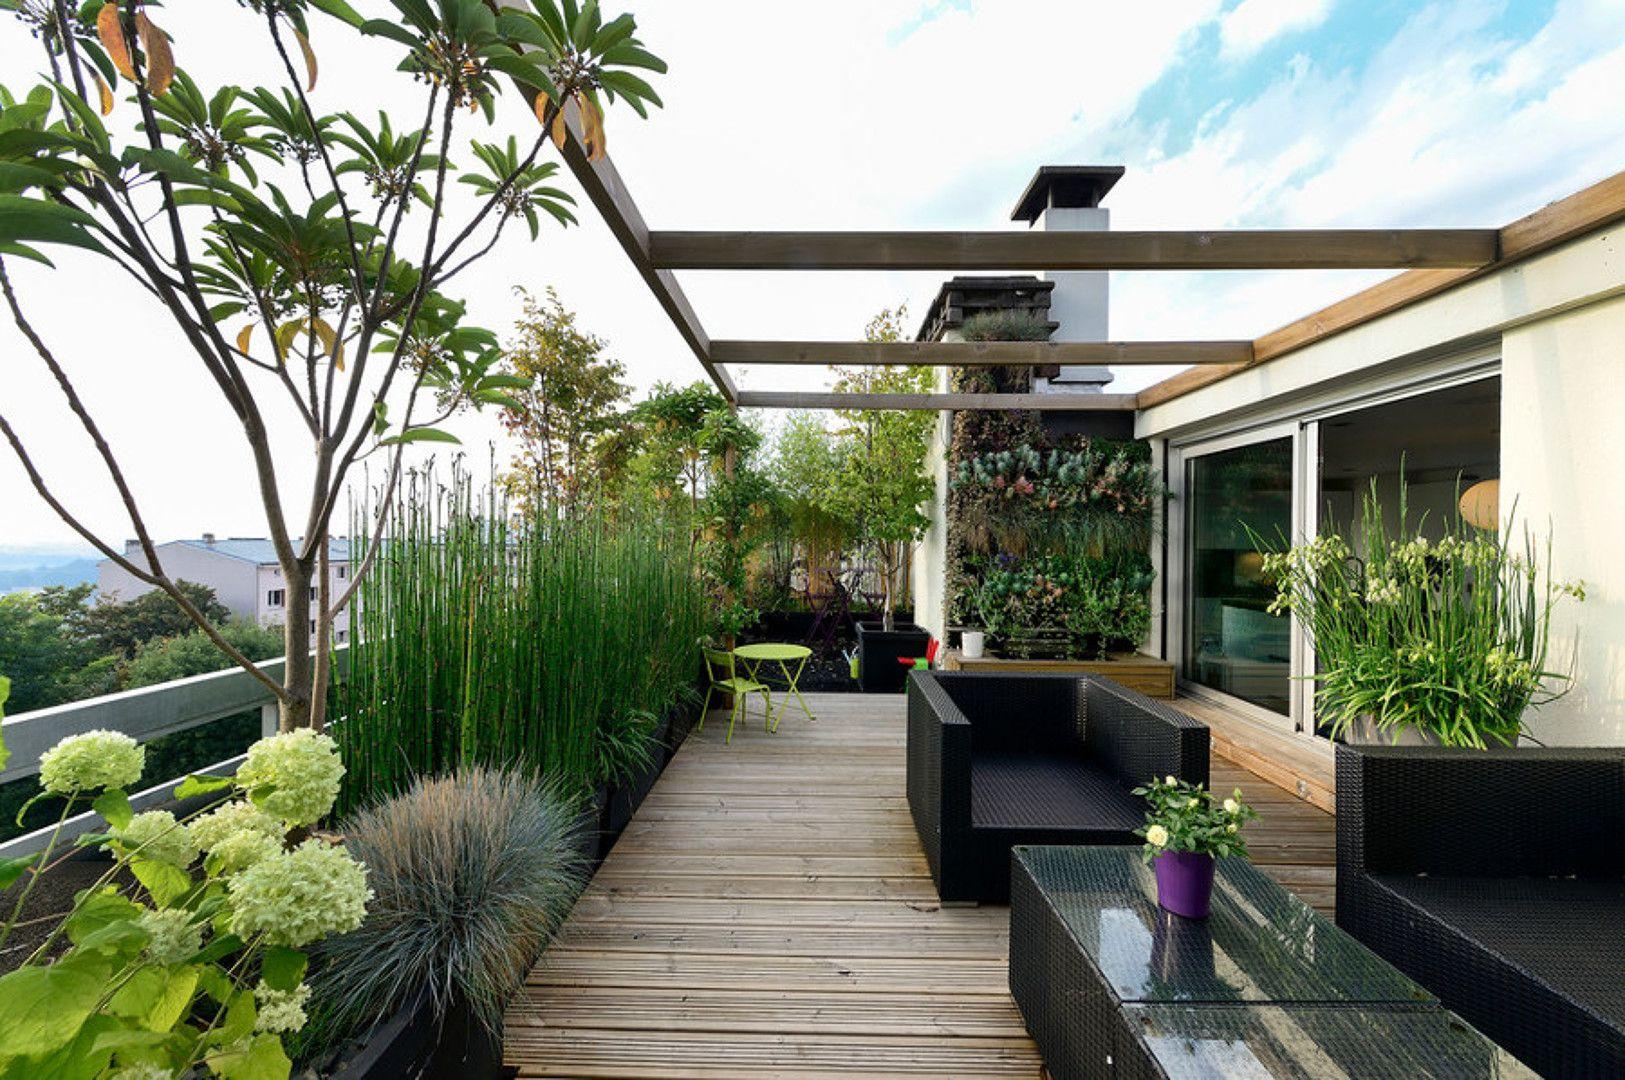 Genial Image Result For Roof Terrace Garden Design